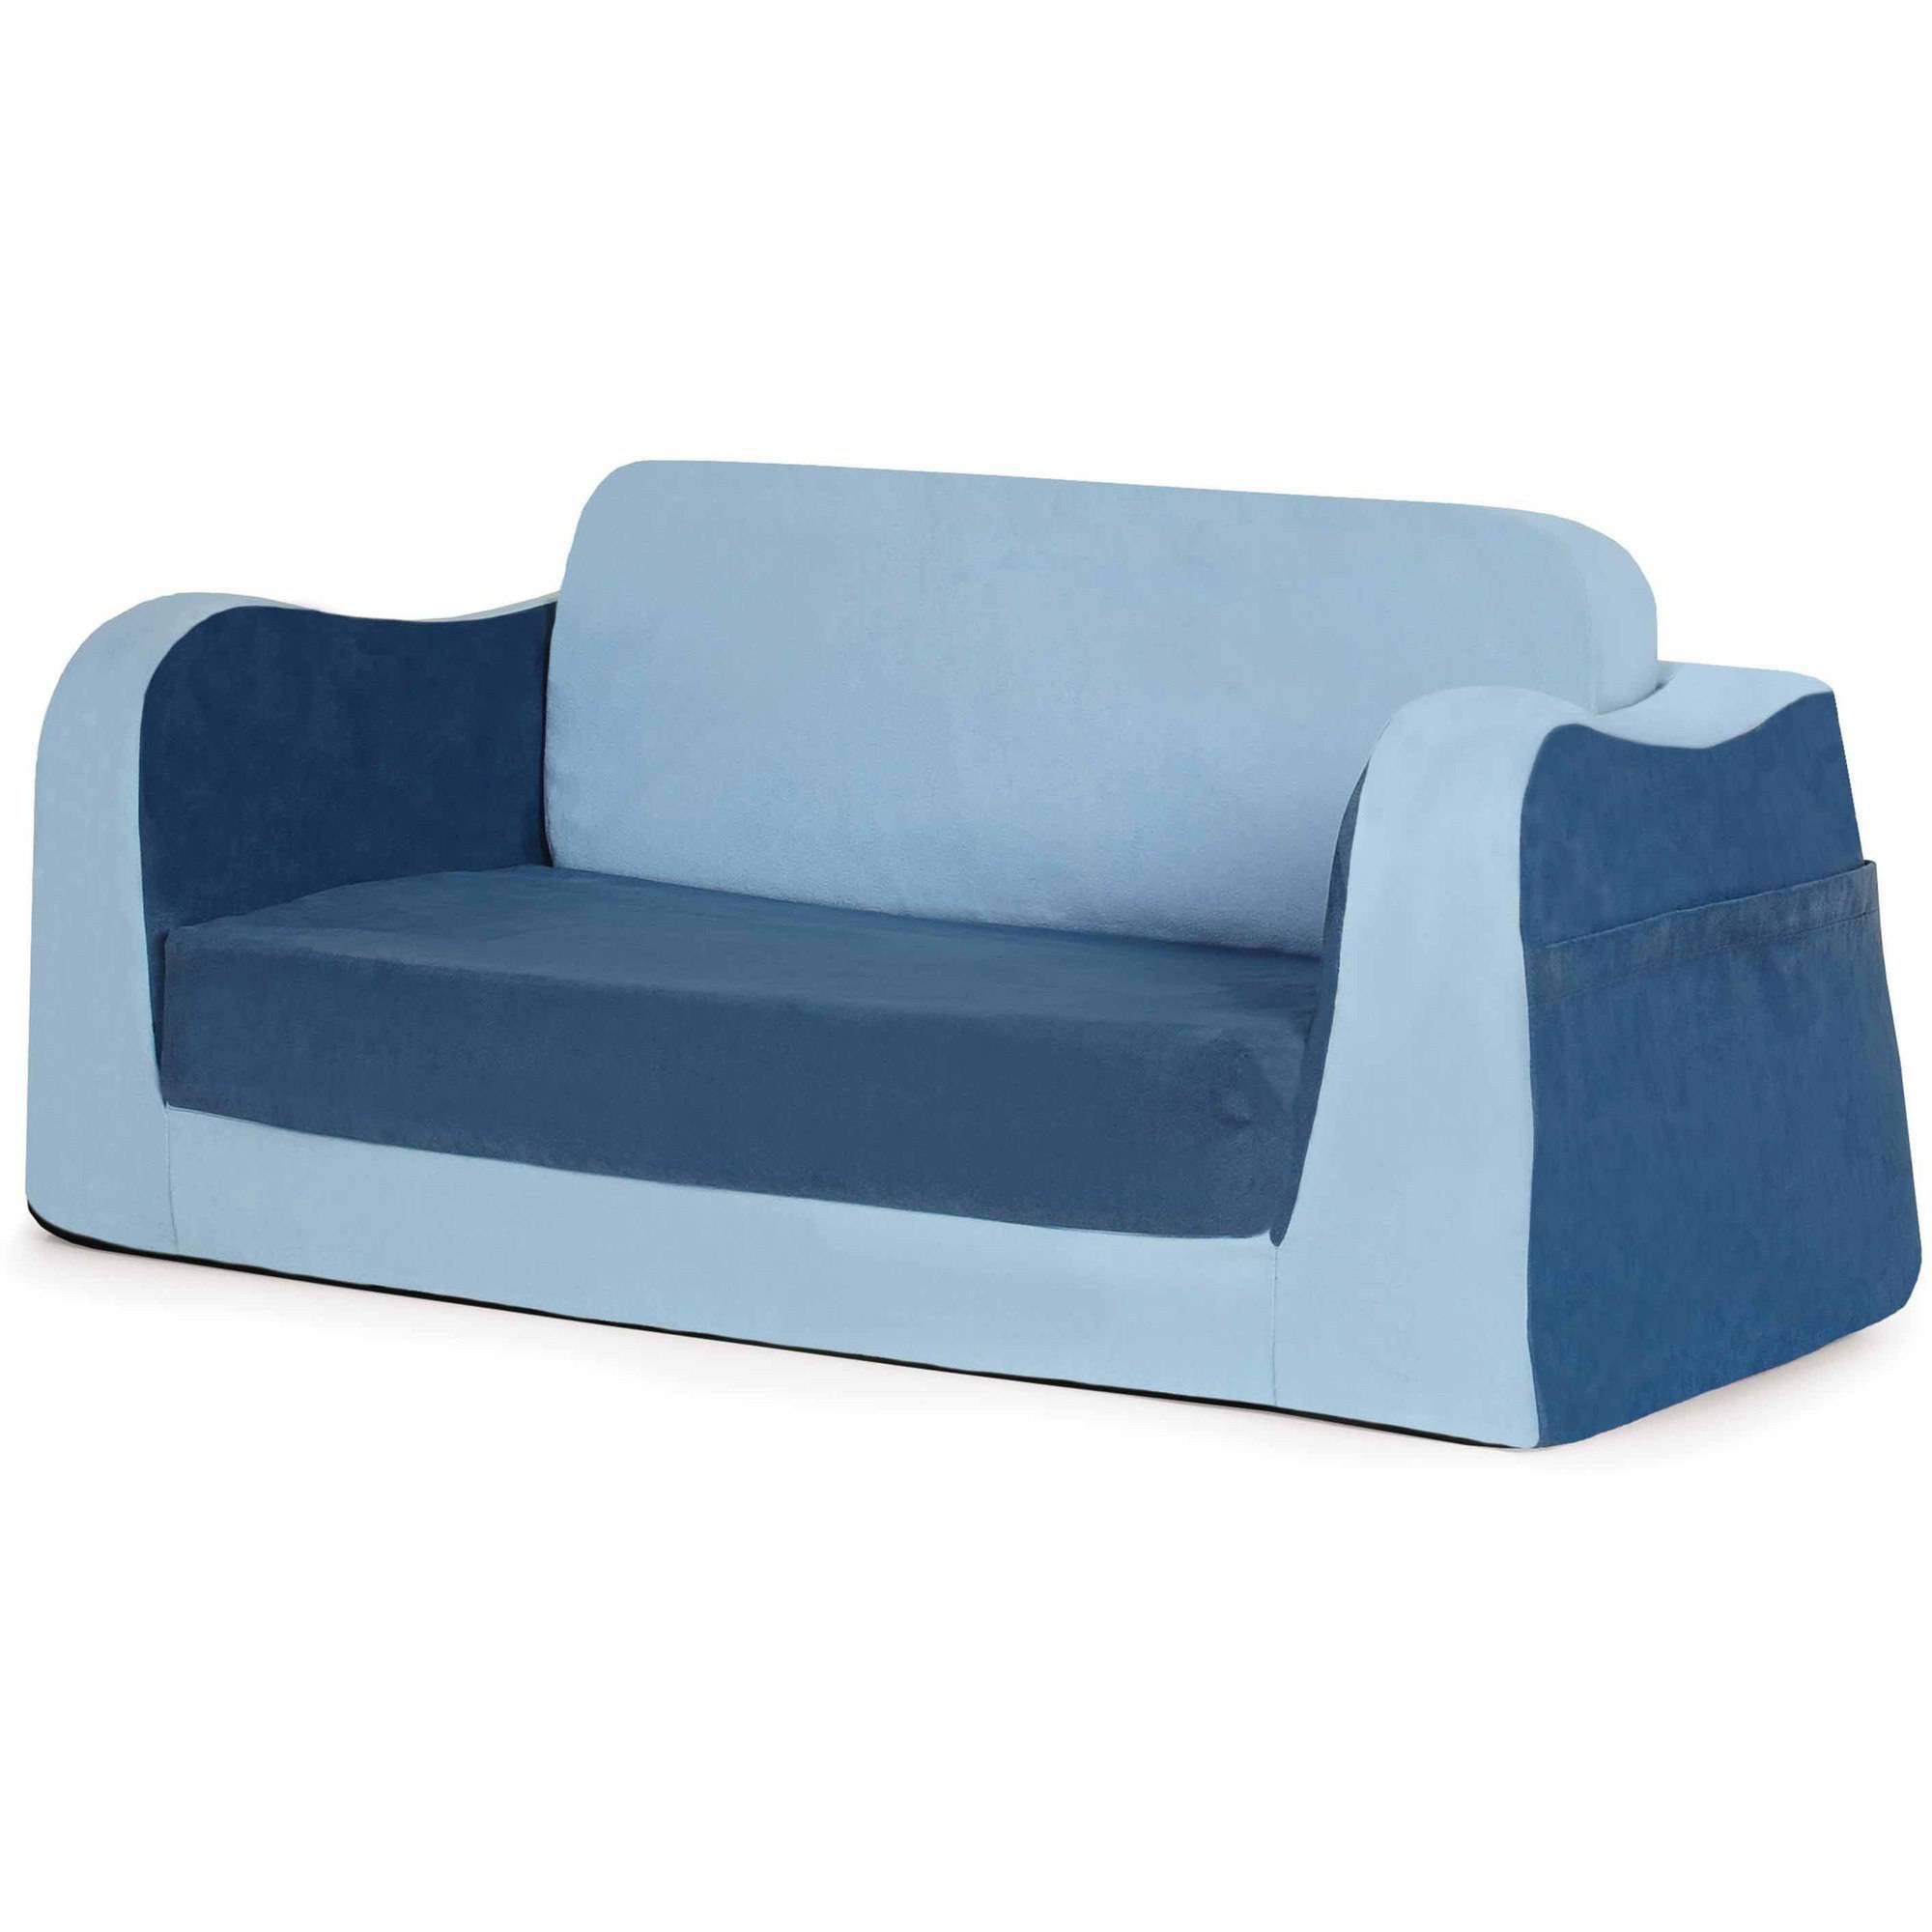 P'kolino Little Reader Sofa, Multiple Colors by Pkolino